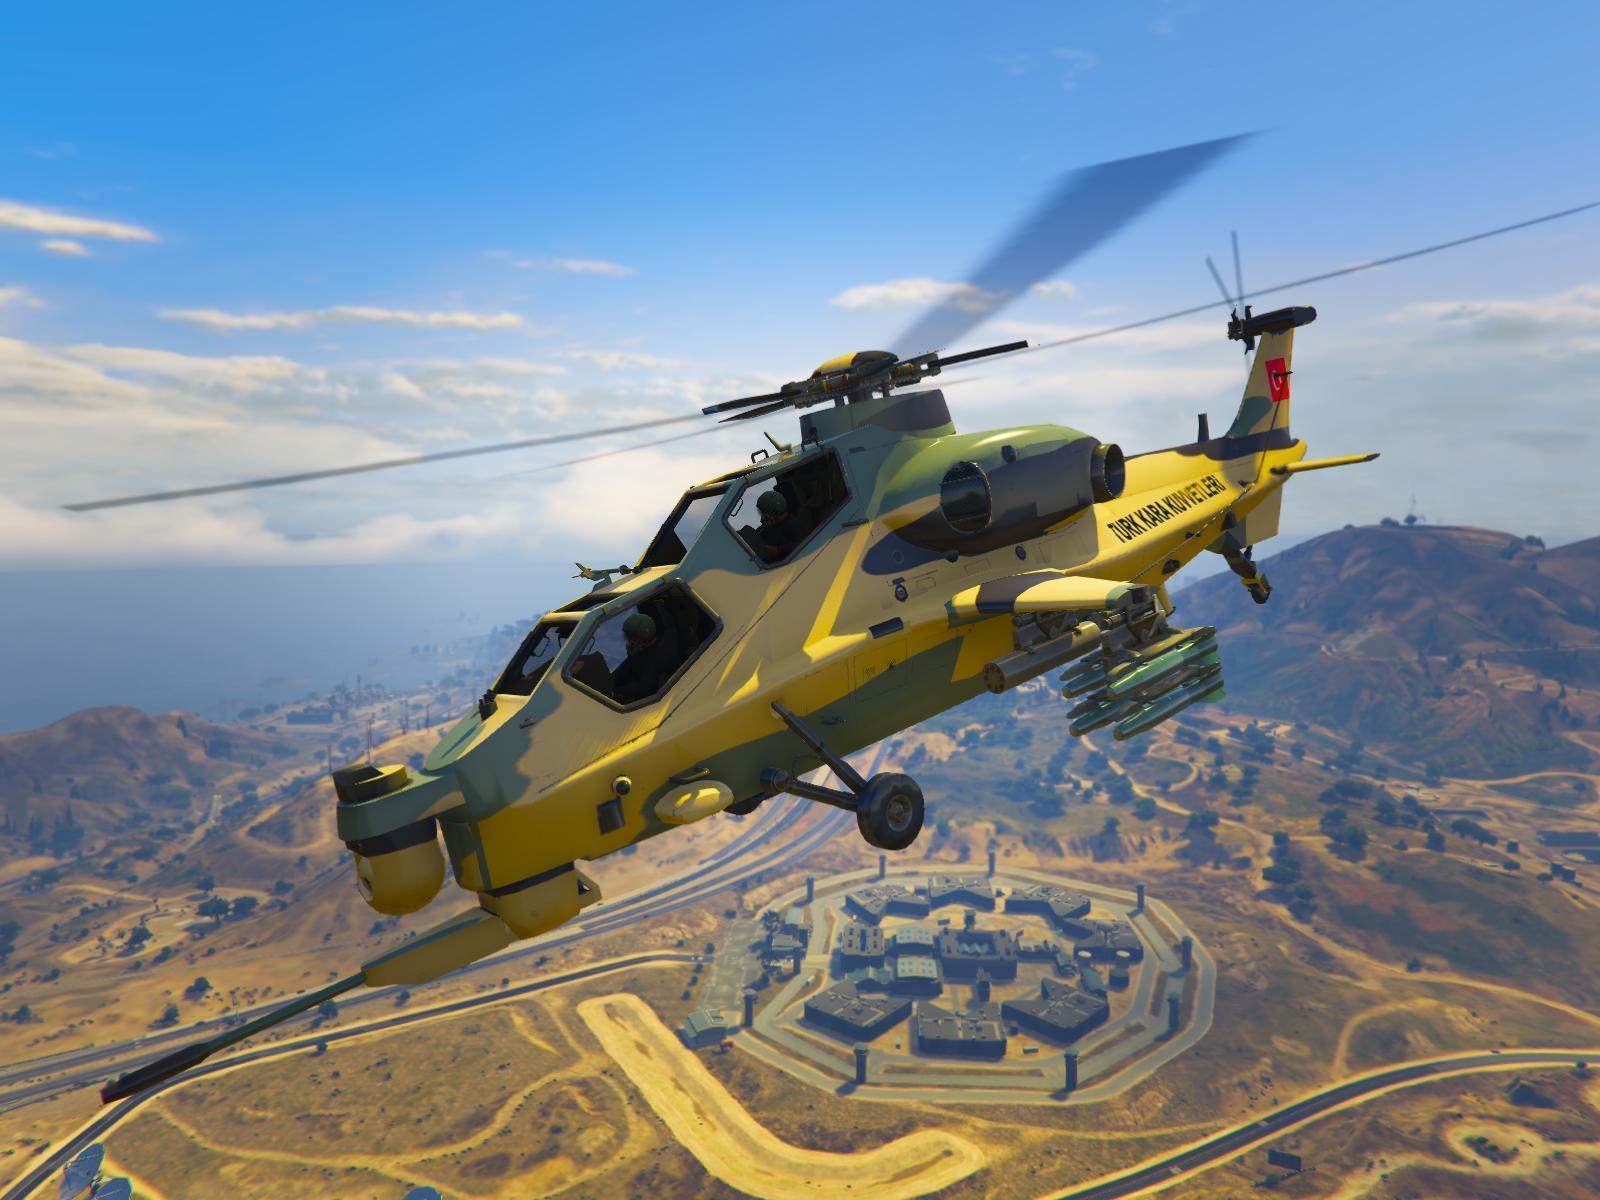 Elicottero Gta 5 : Turkish land forces helicopter turk kara kuvvetleri atak